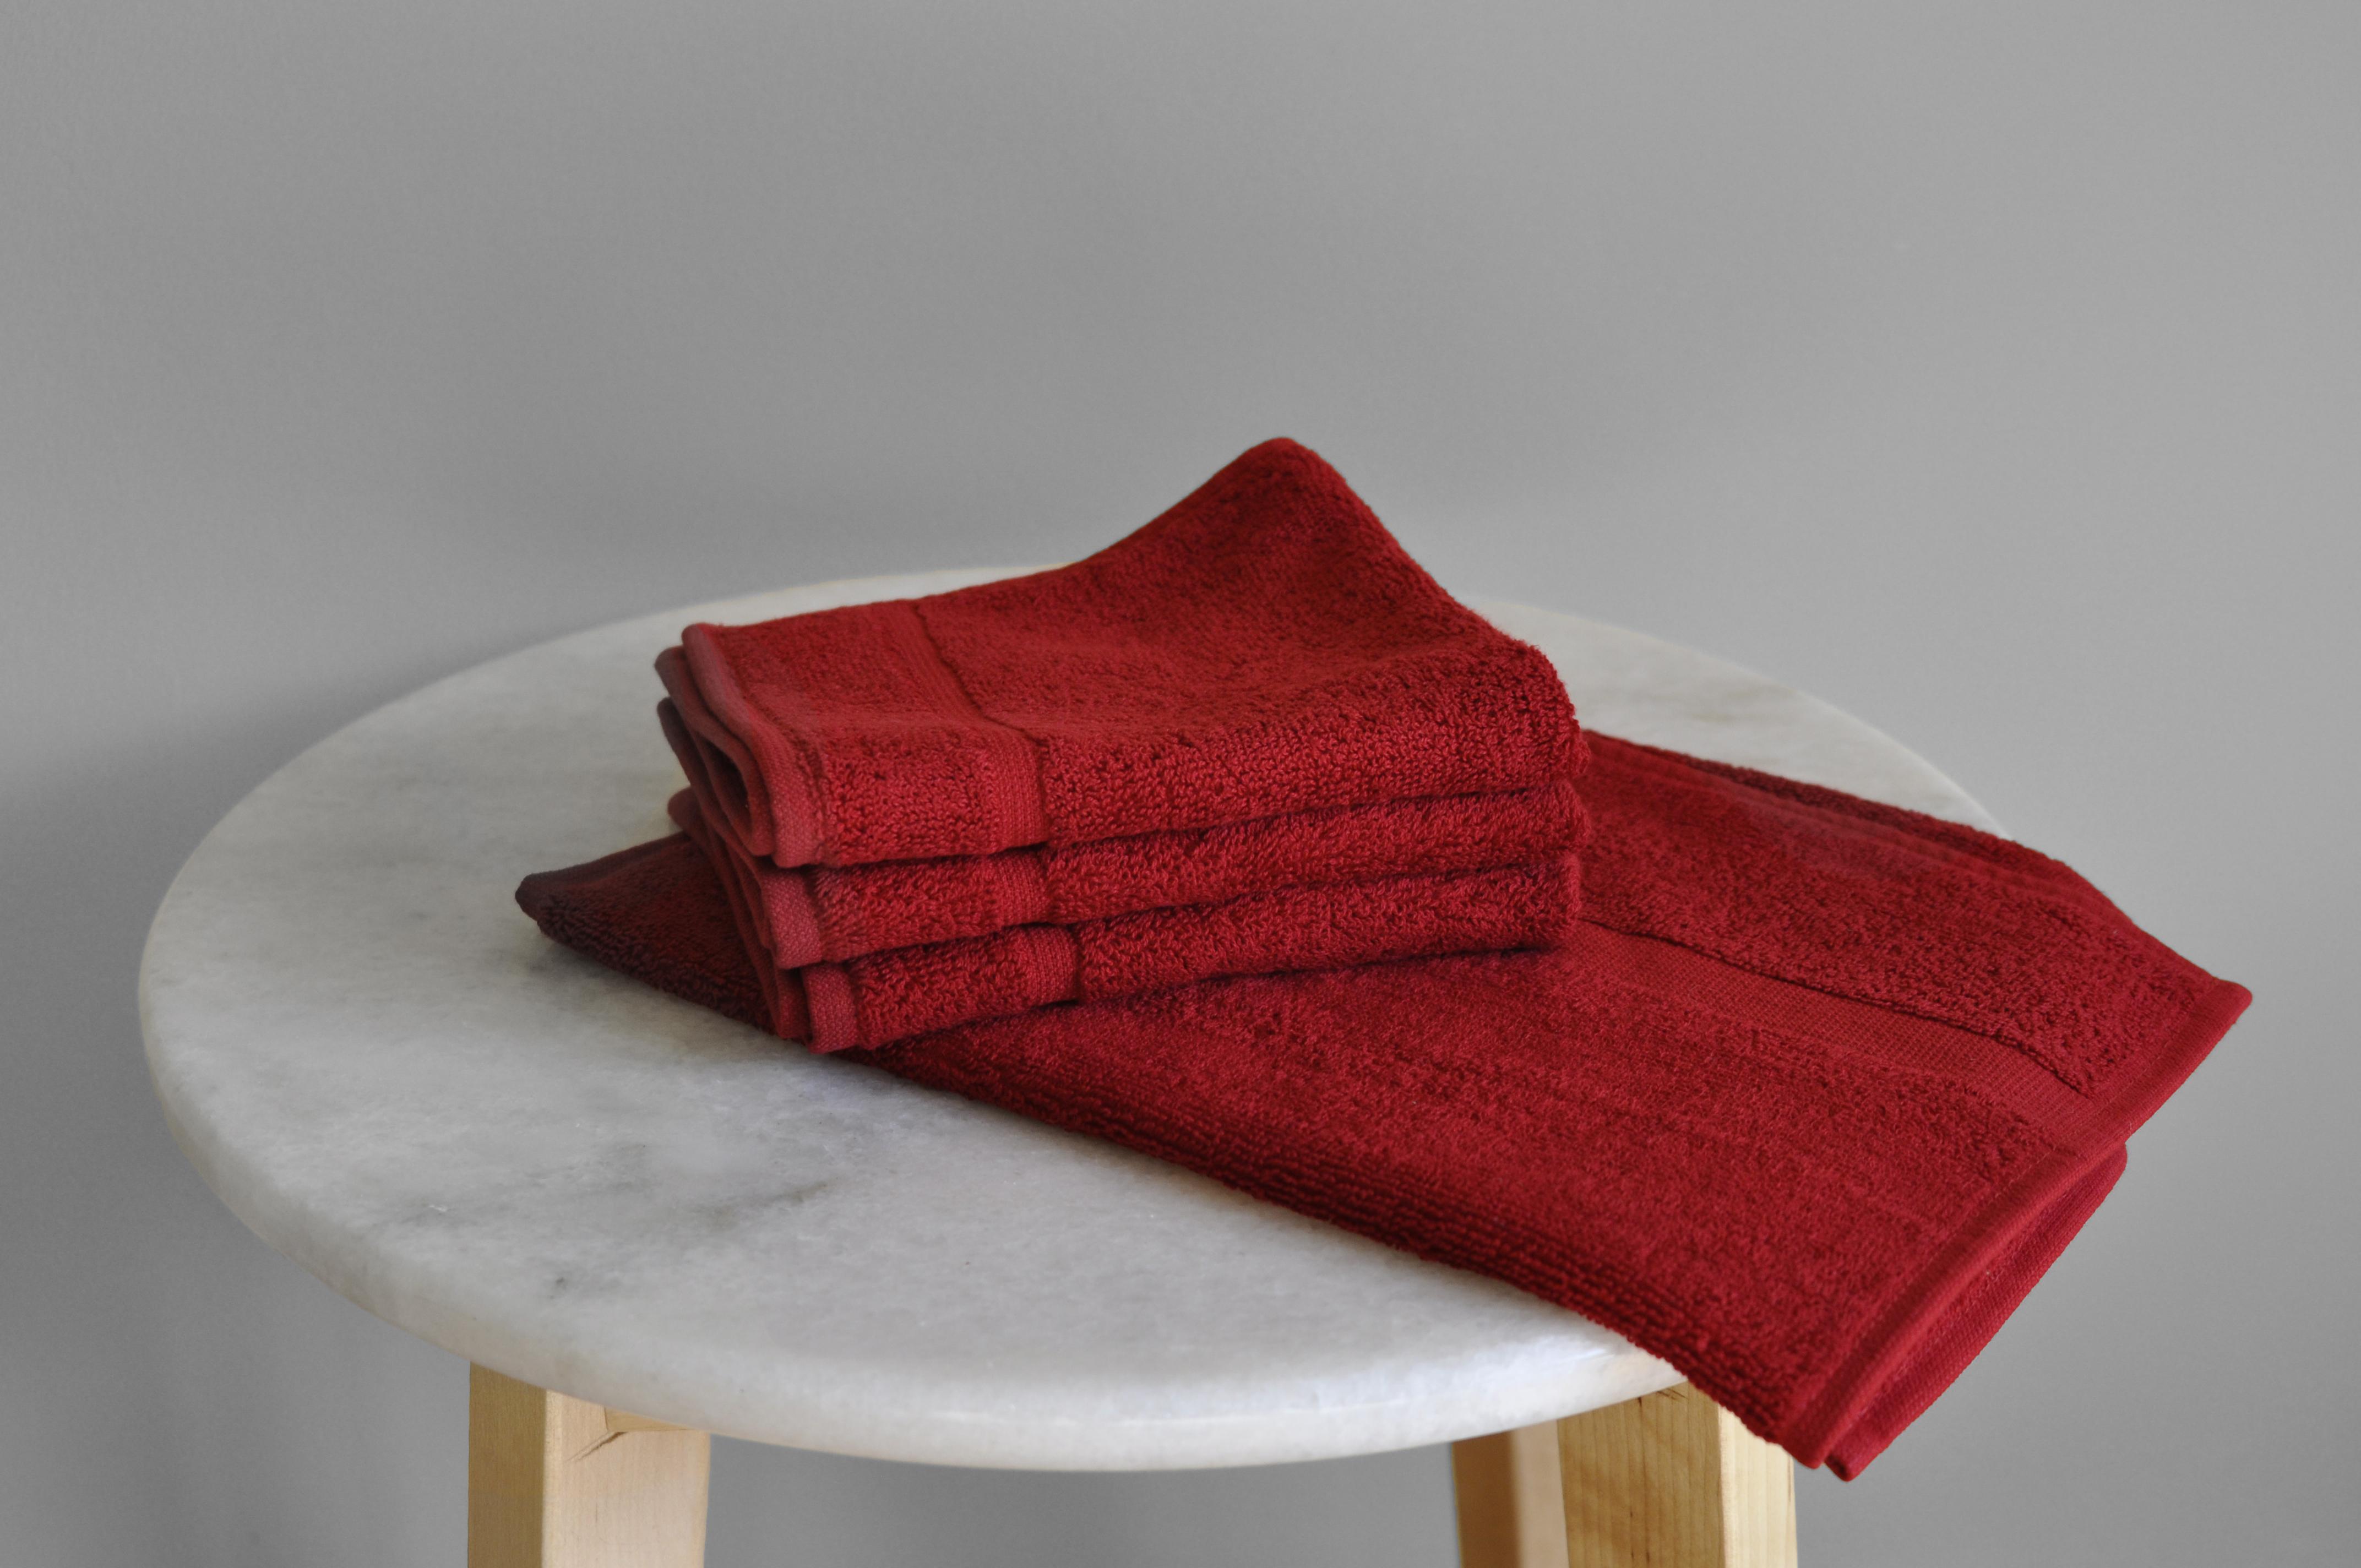 Fiery Red Towels